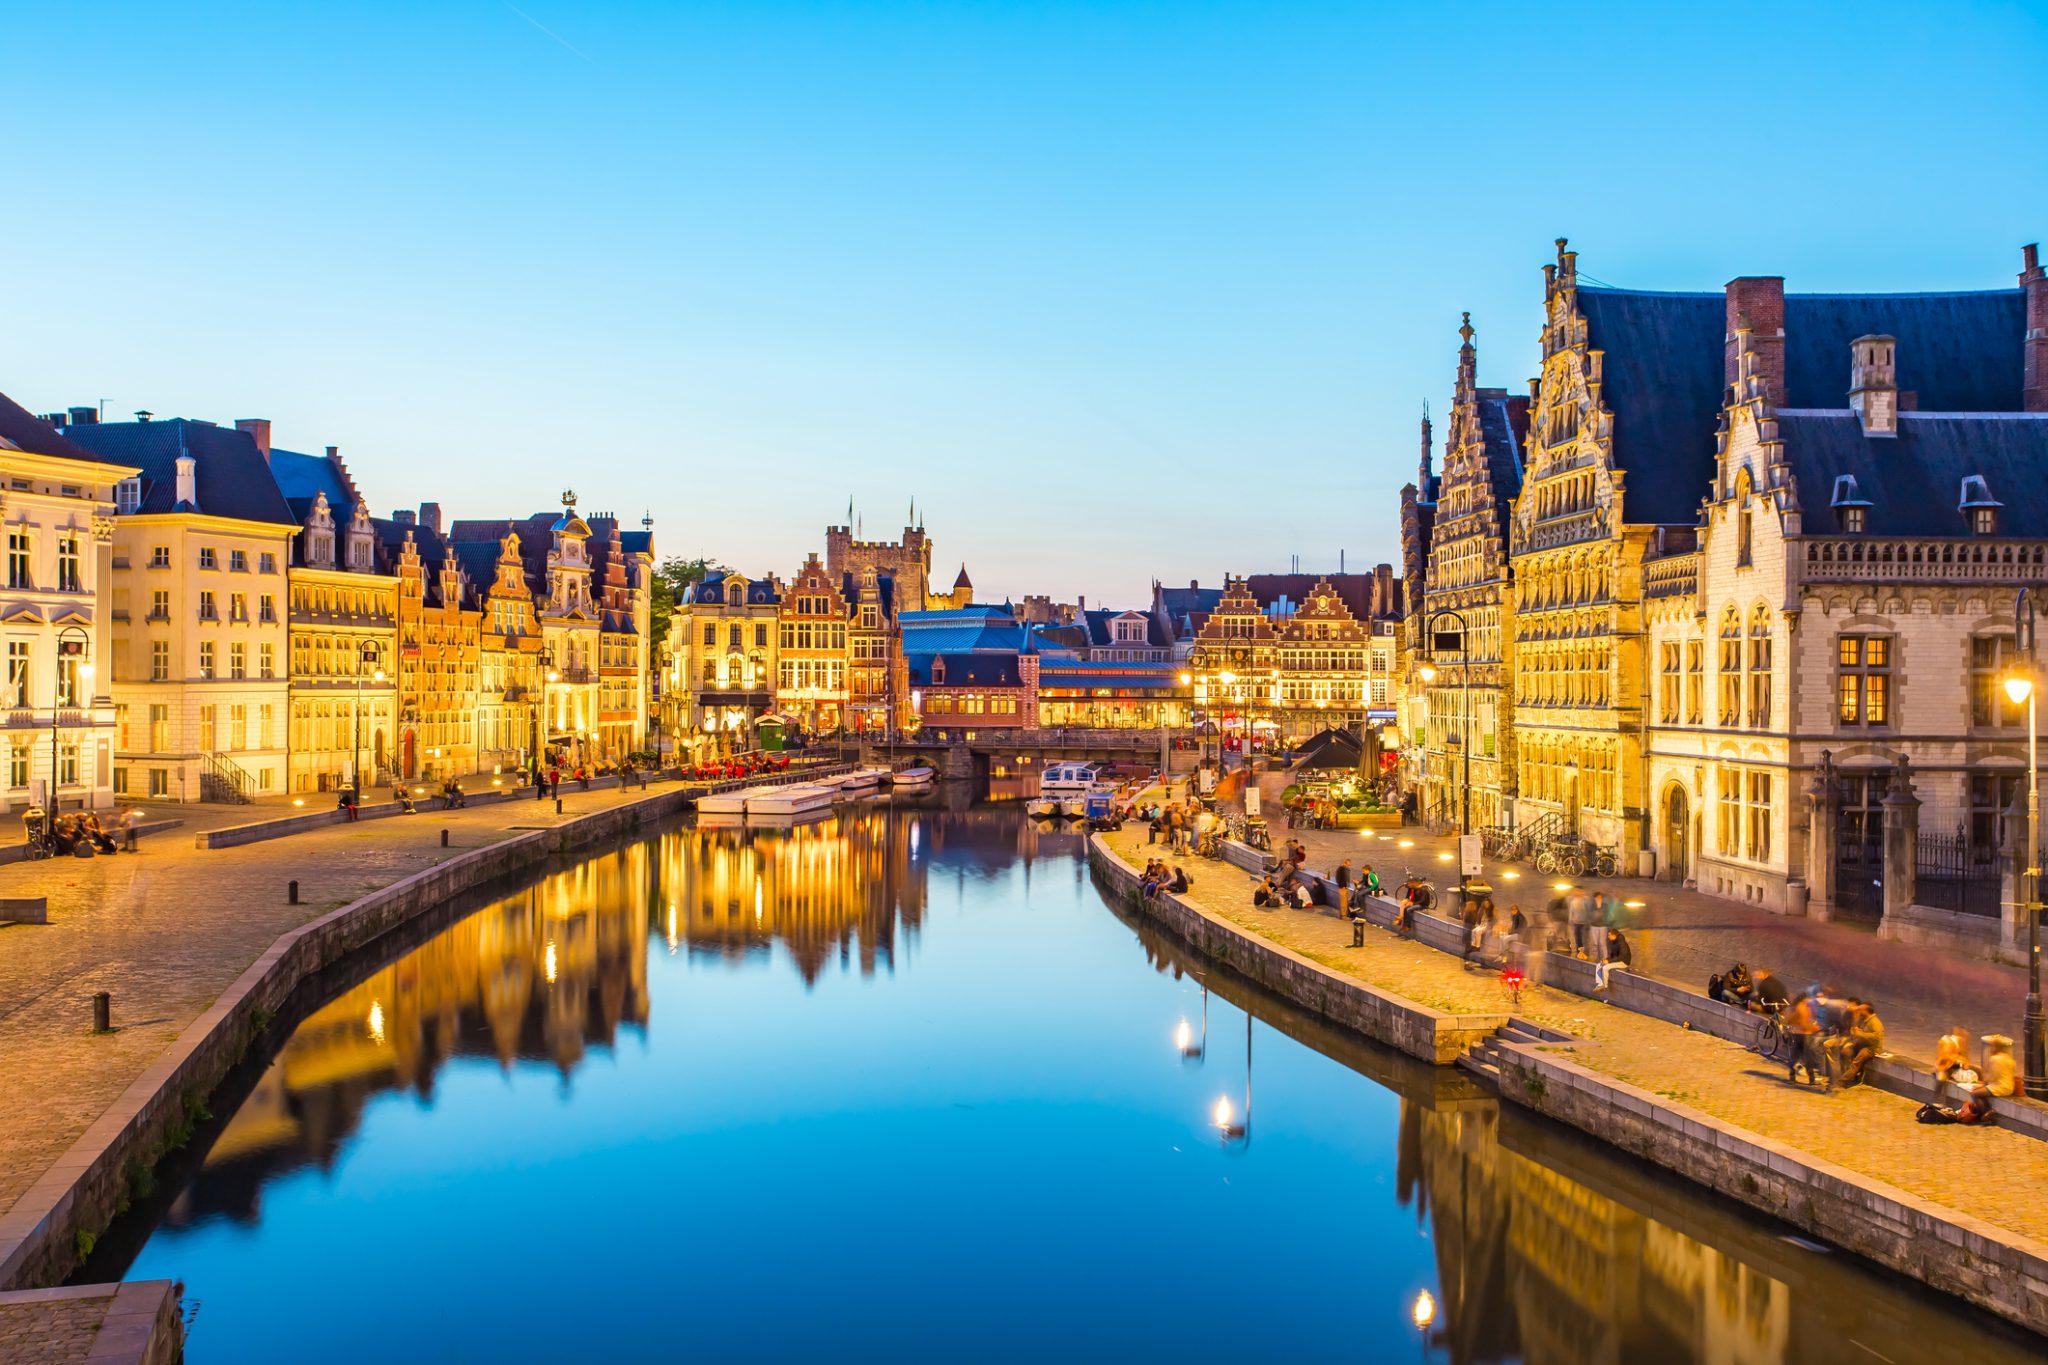 Ghent canal in Belgium.